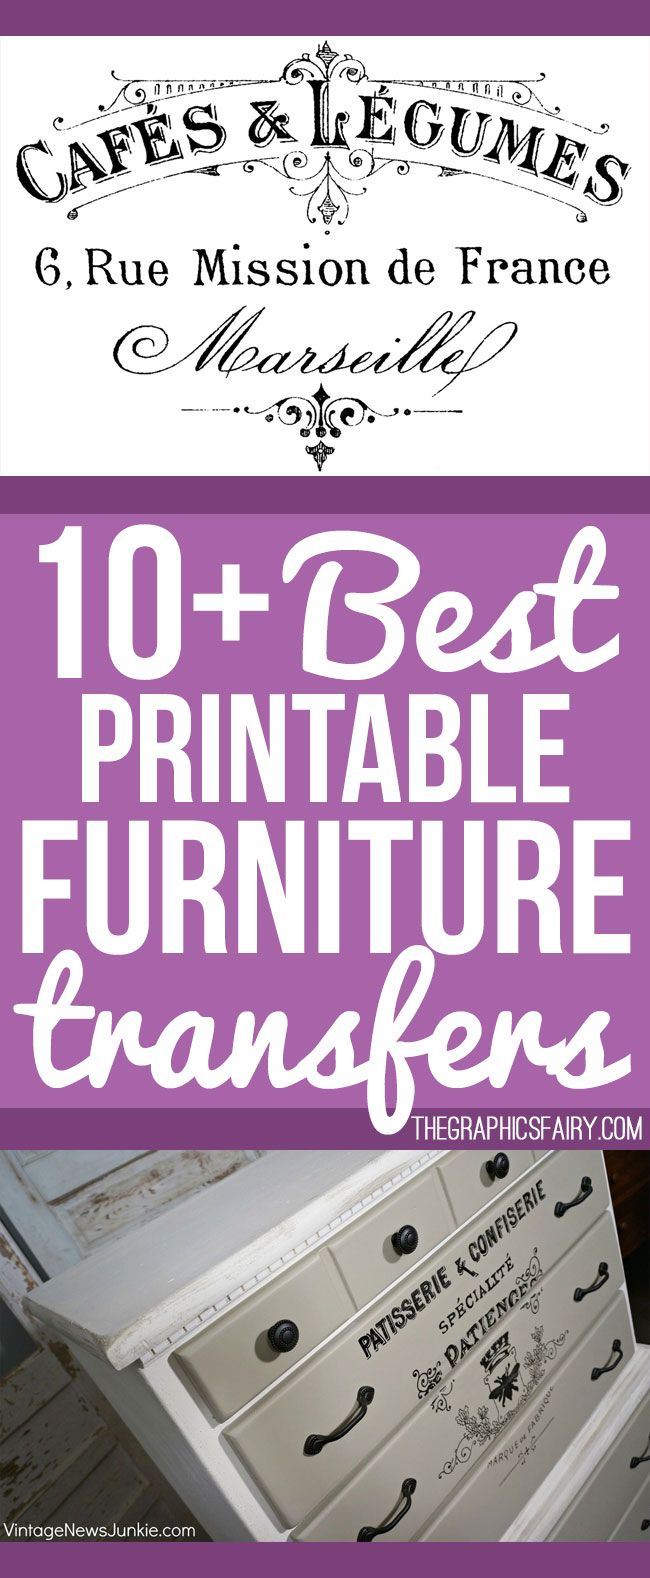 photo regarding Printable Transfers referred to as 10+ Suitable Printable Transfers for Home furniture - No cost